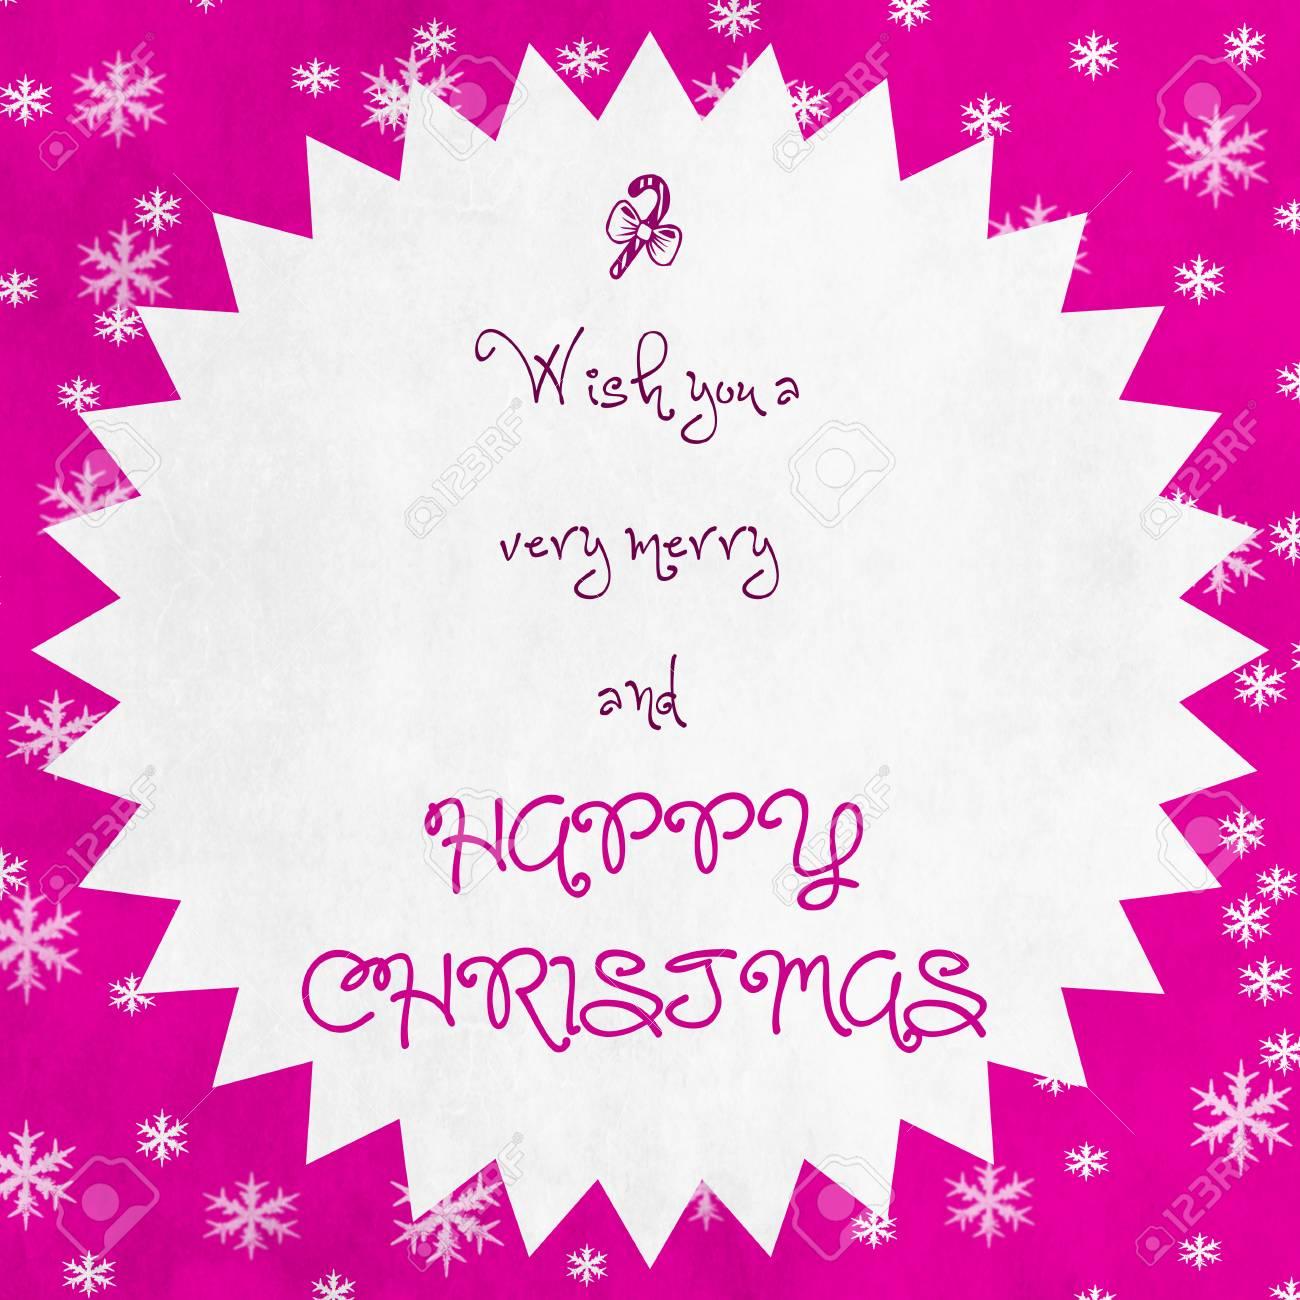 Merry christmas season greetings quote stock photo picture and merry christmas season greetings quote stock photo 34123200 m4hsunfo